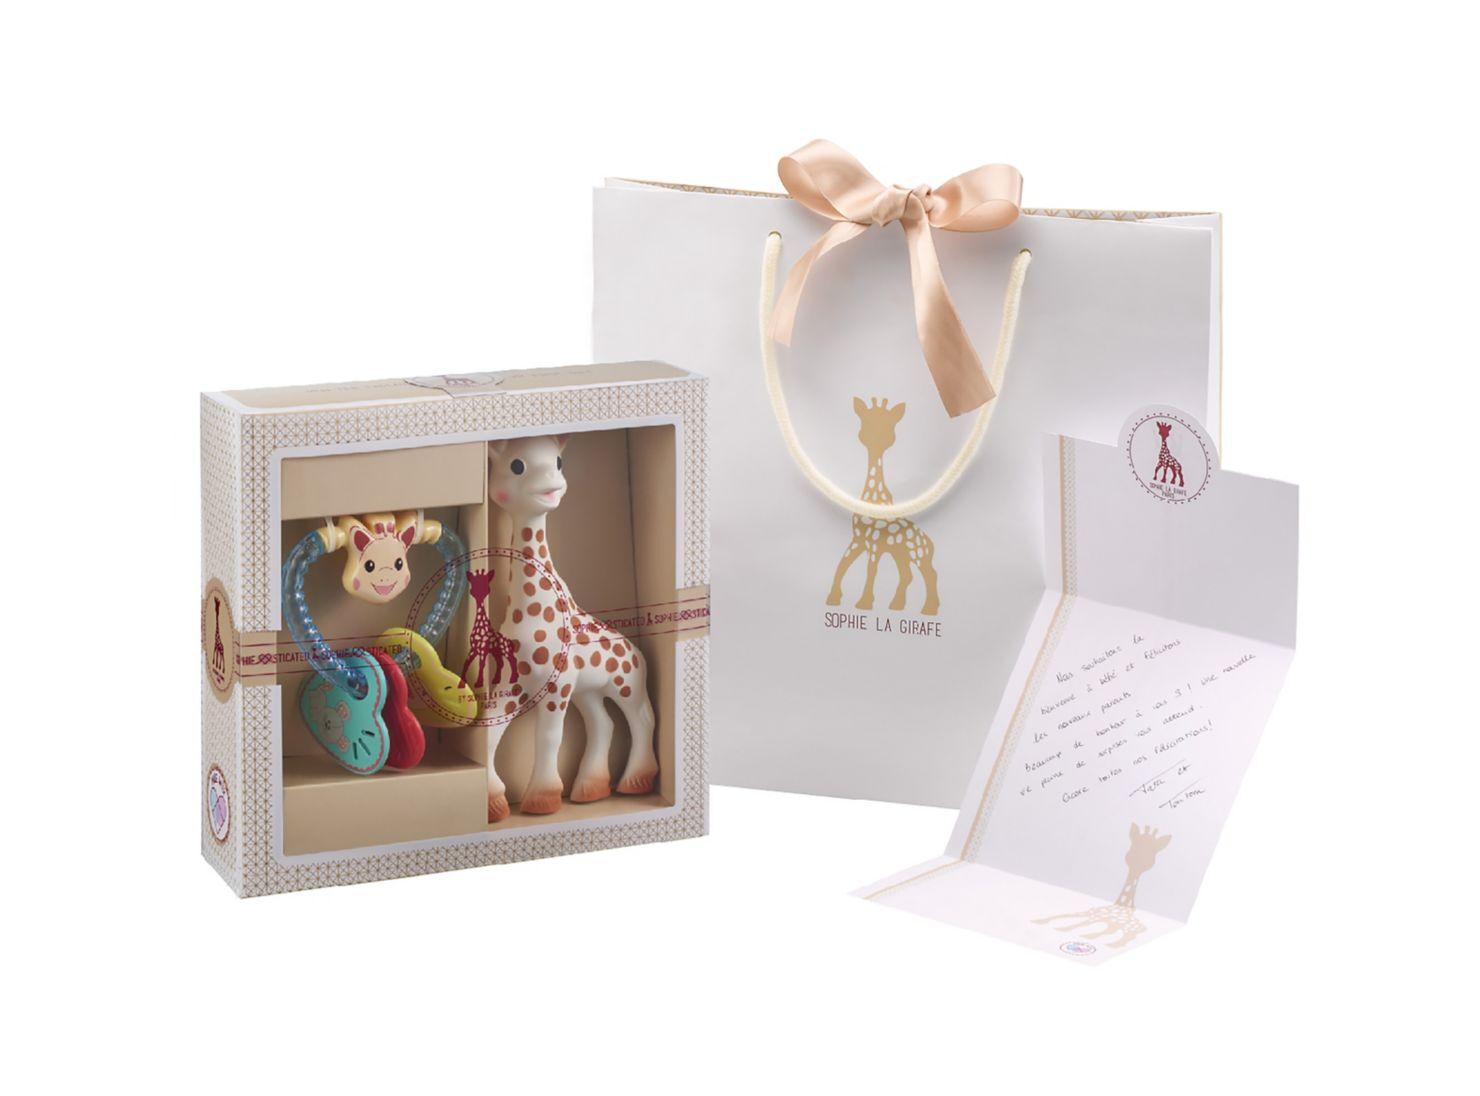 Regalo Set JirafaCascabel Girafe La Sophie Juguetes En Tarjeta Qdrtsh